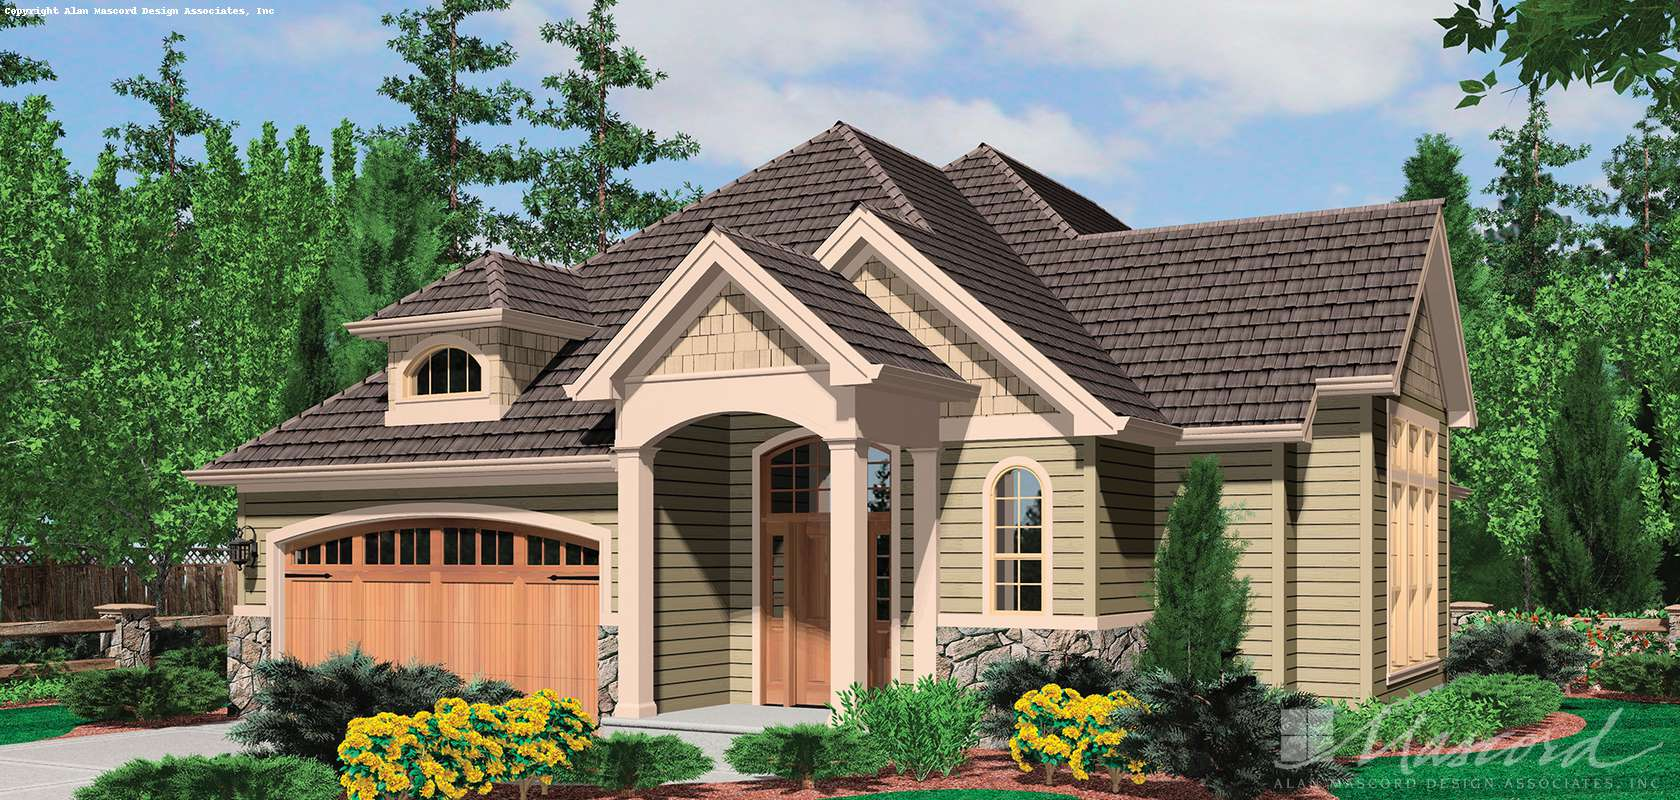 Mascord House Plan 21106: The Richmond